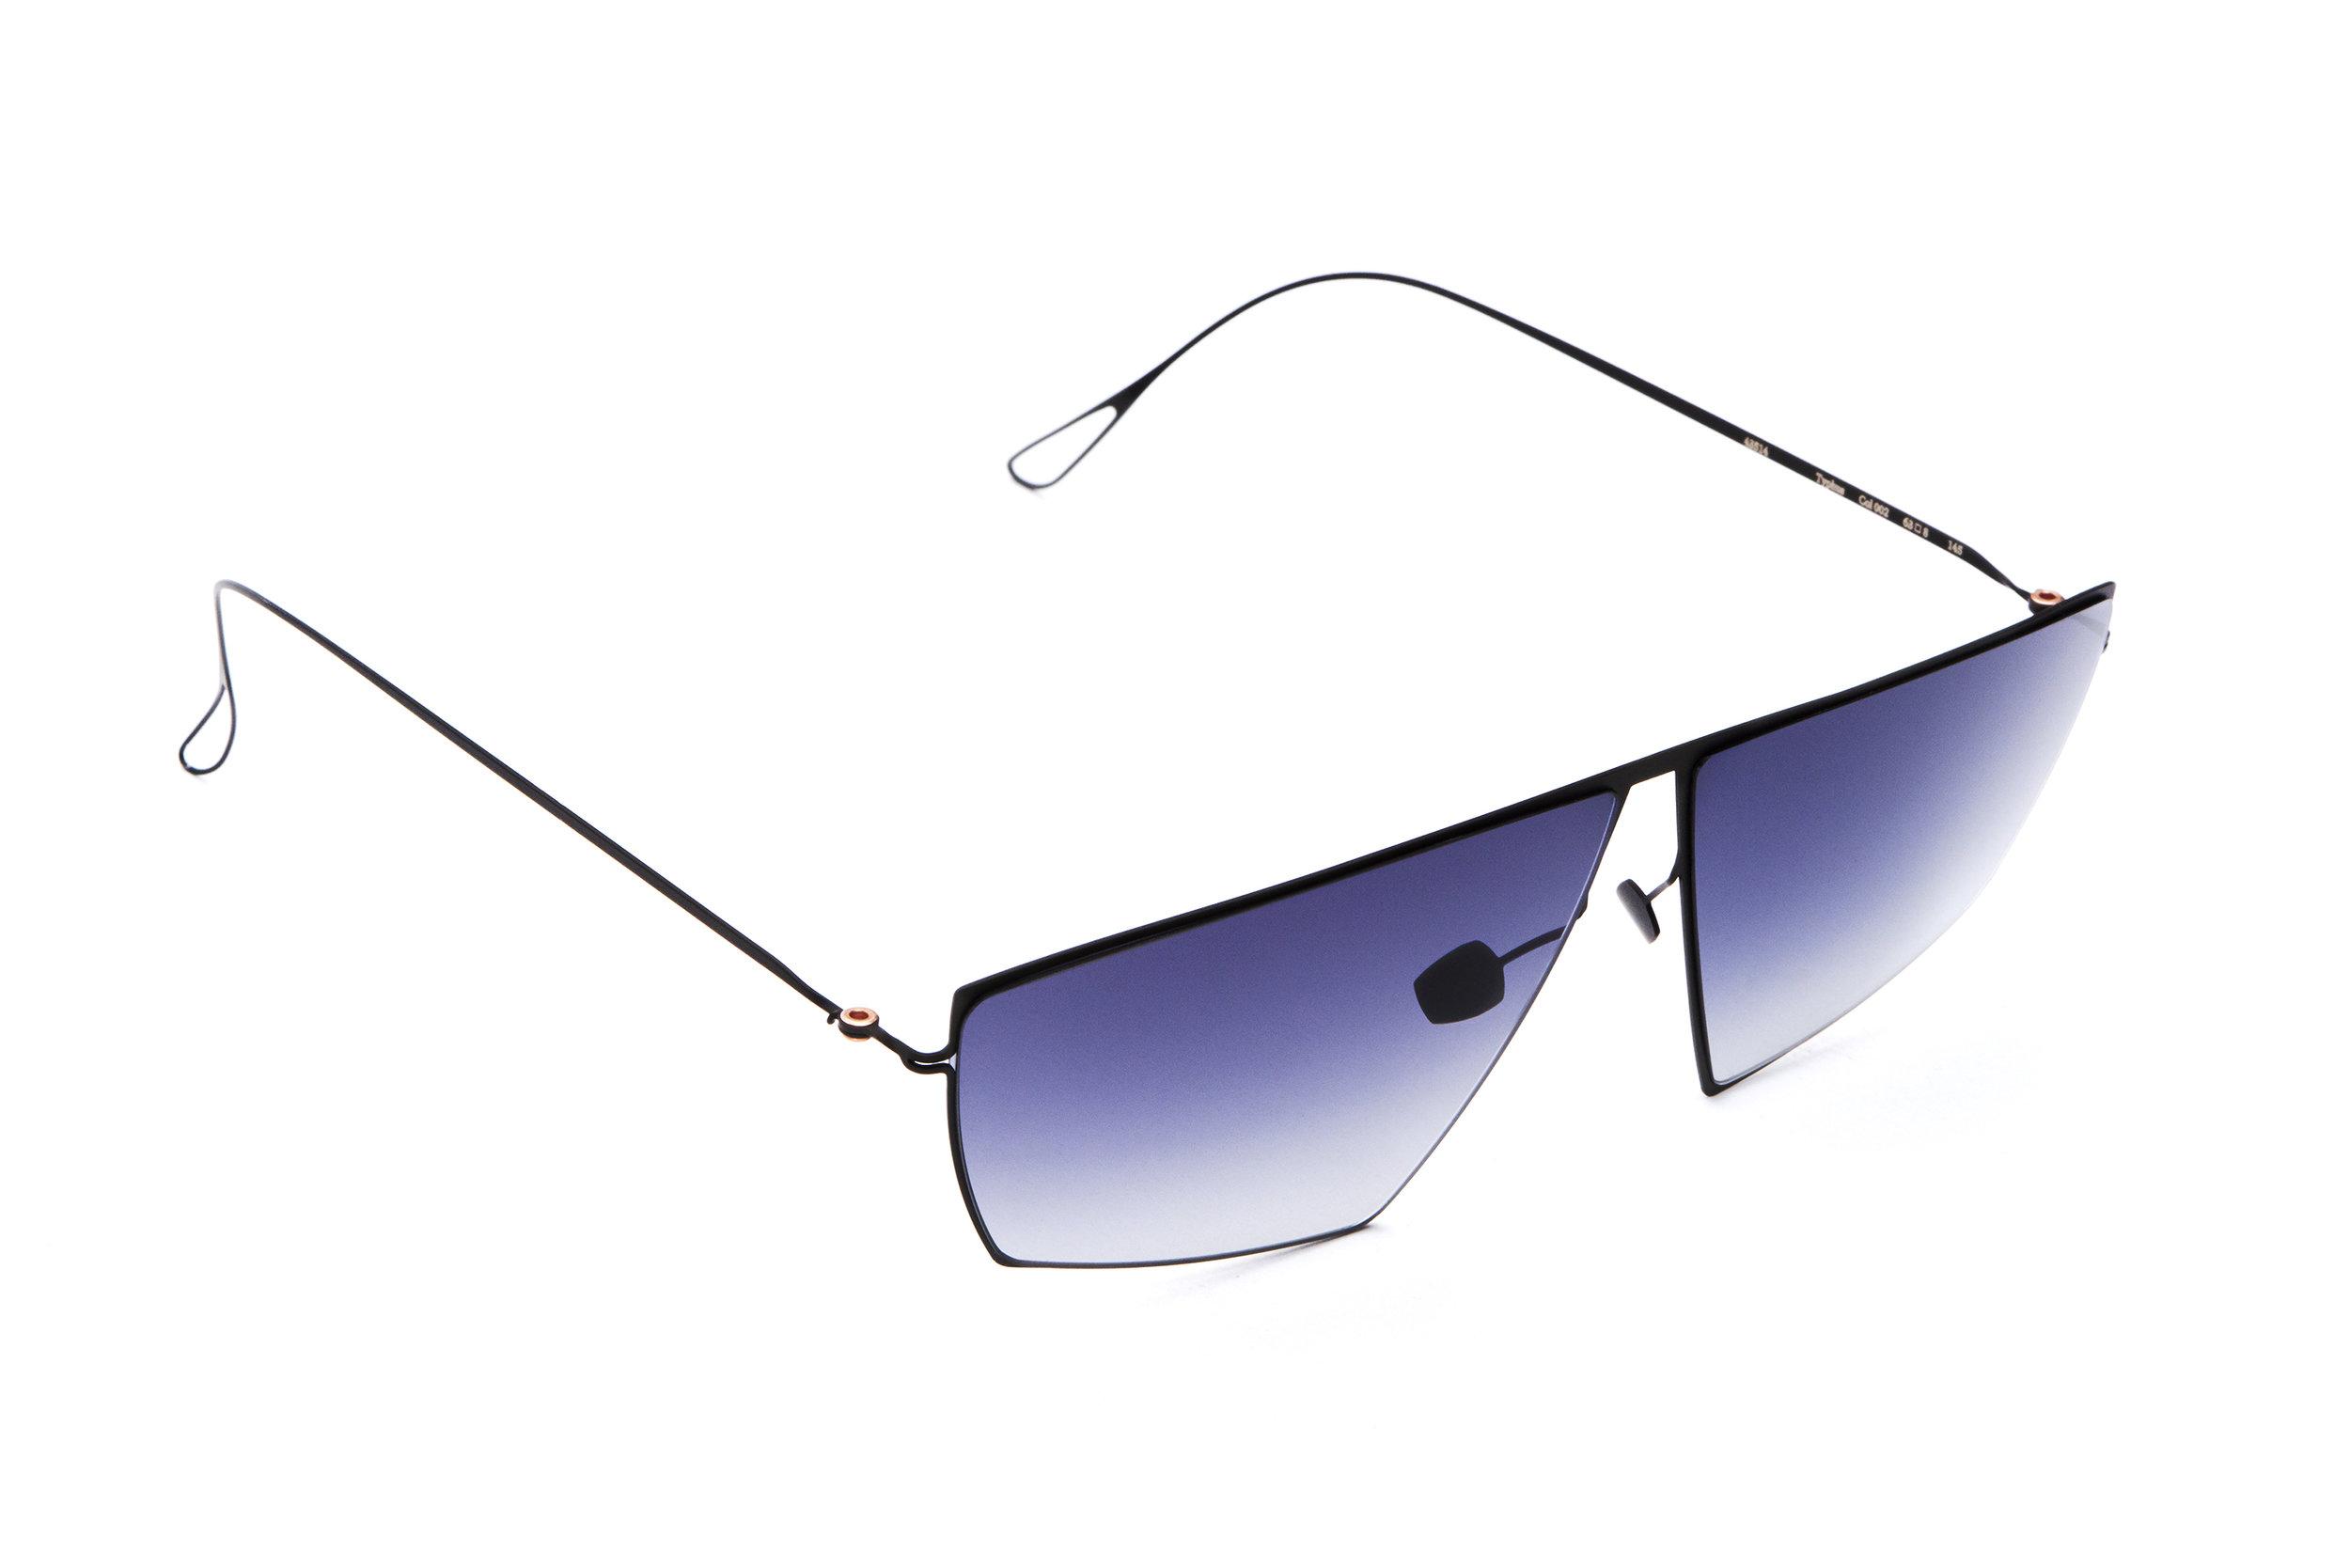 haffmans_neumeister_typhus_black_tempest_gradient_ultralight_sunglasses_angle_102441.jpg